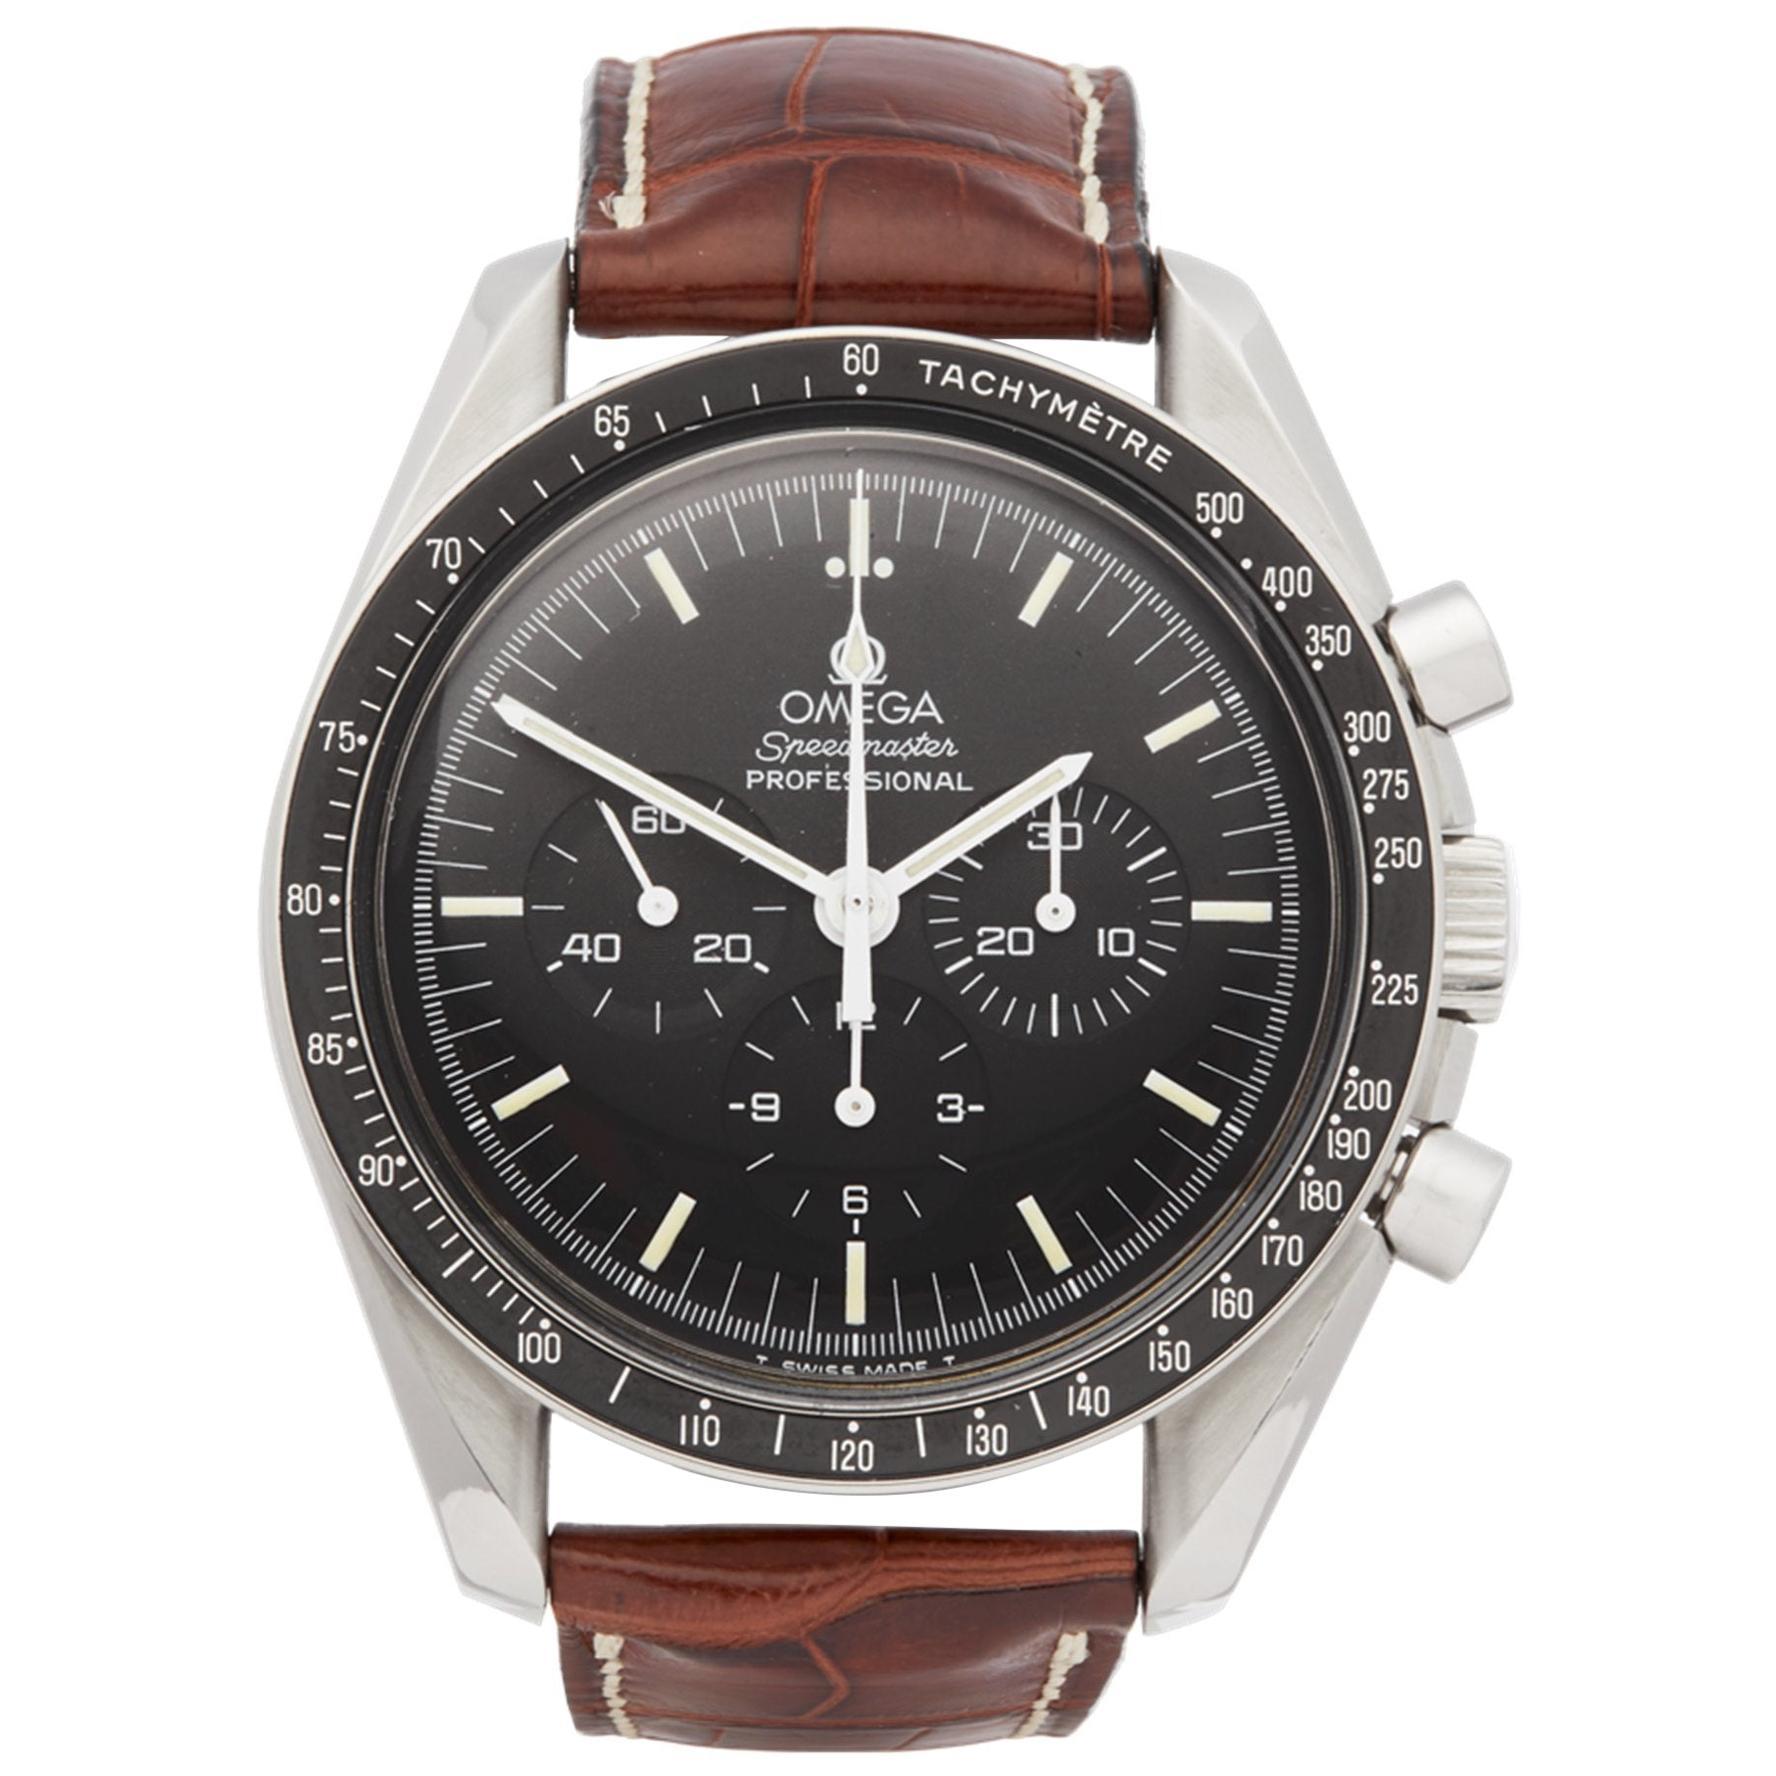 Omega Speedmaster 145.022 Men's Stainless Steel Chronograph Watch